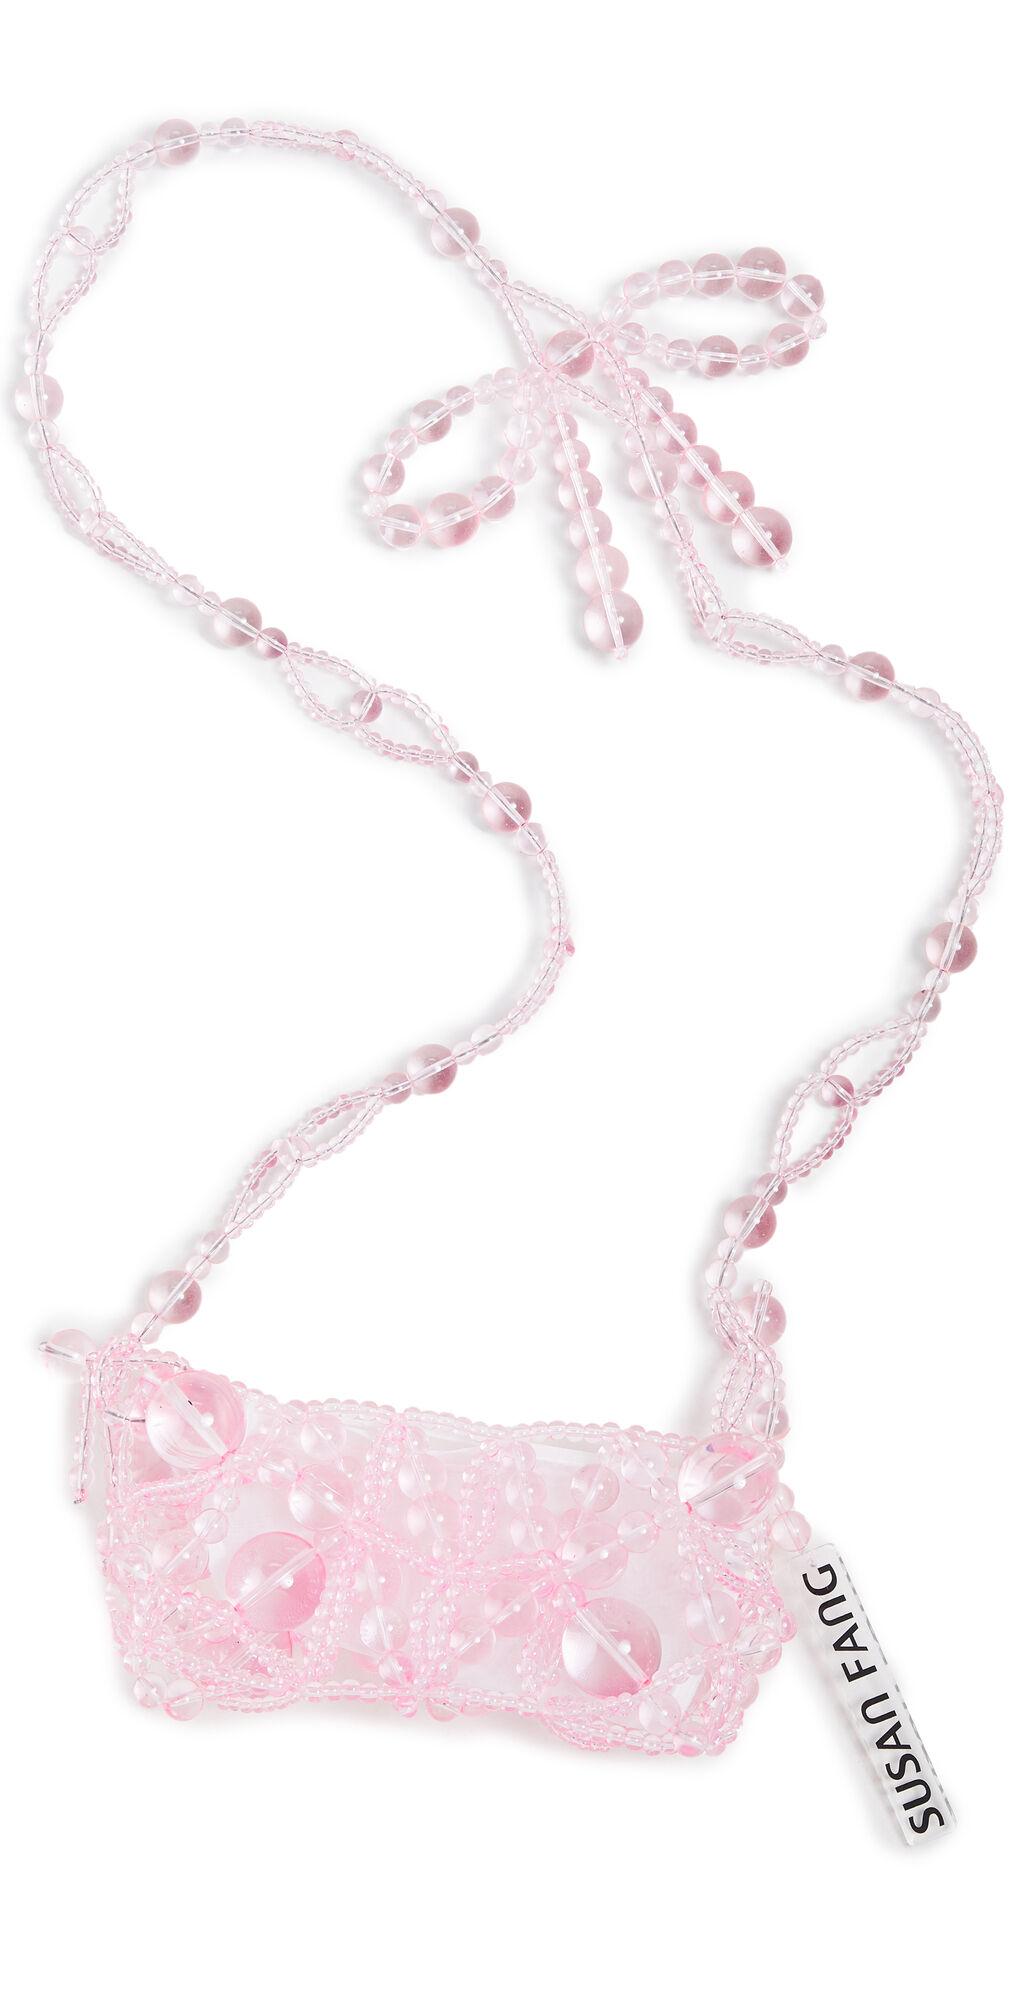 Susan Fang Bubble Pow Phone Crossbody Bag  - Pink - Size: One Size